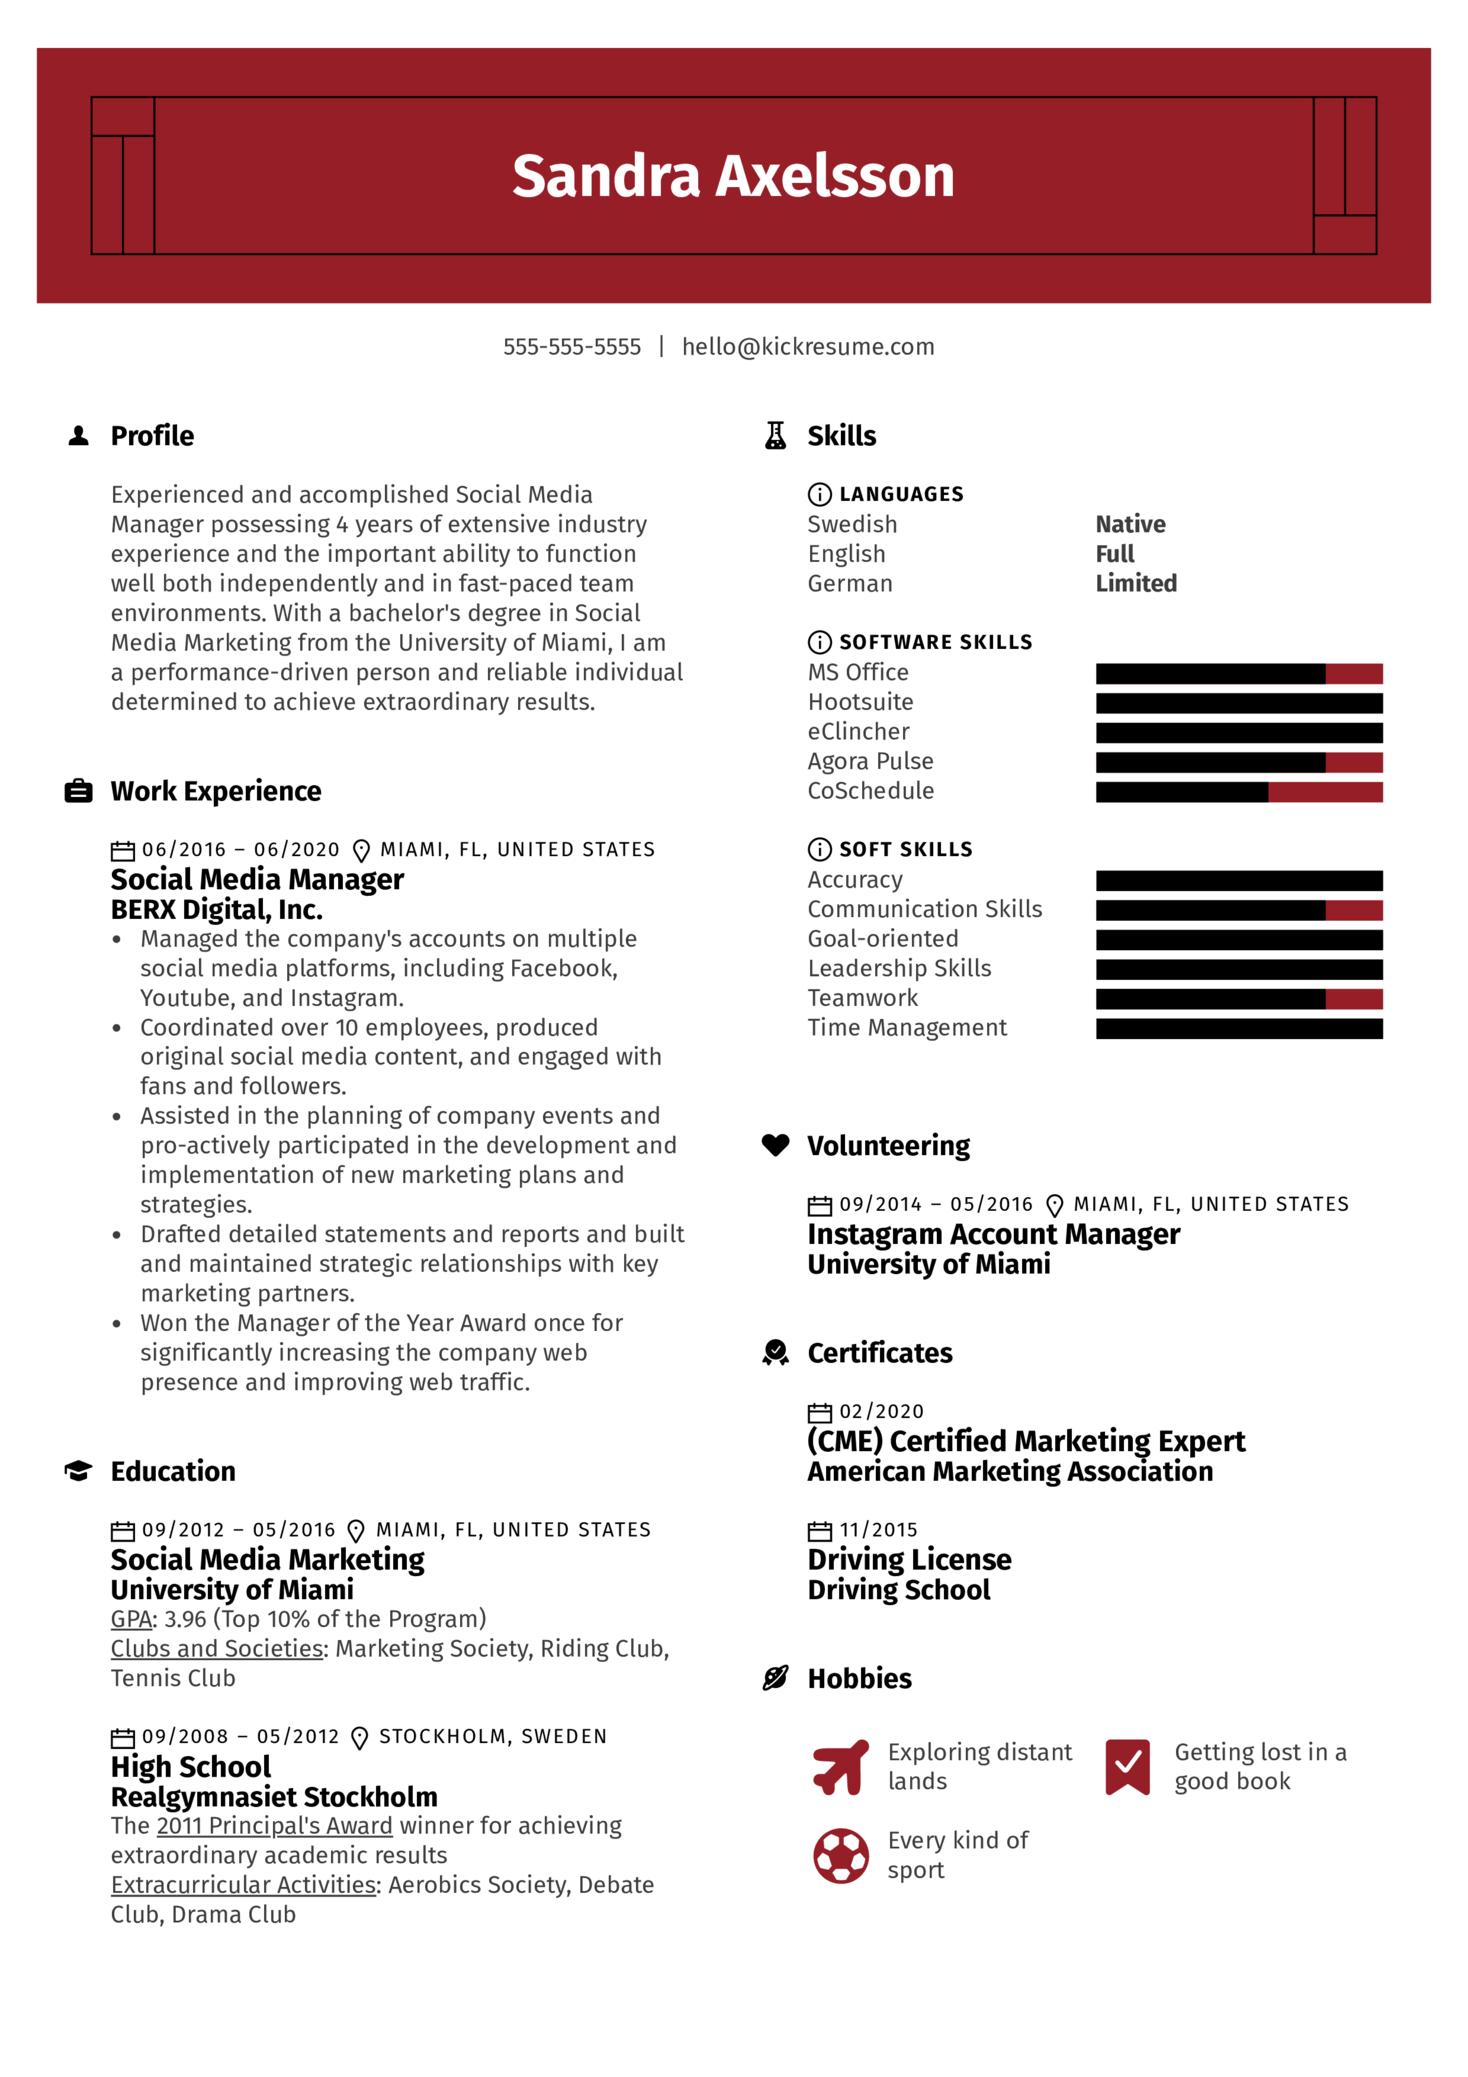 Professional Social Media Manager Resume Sample